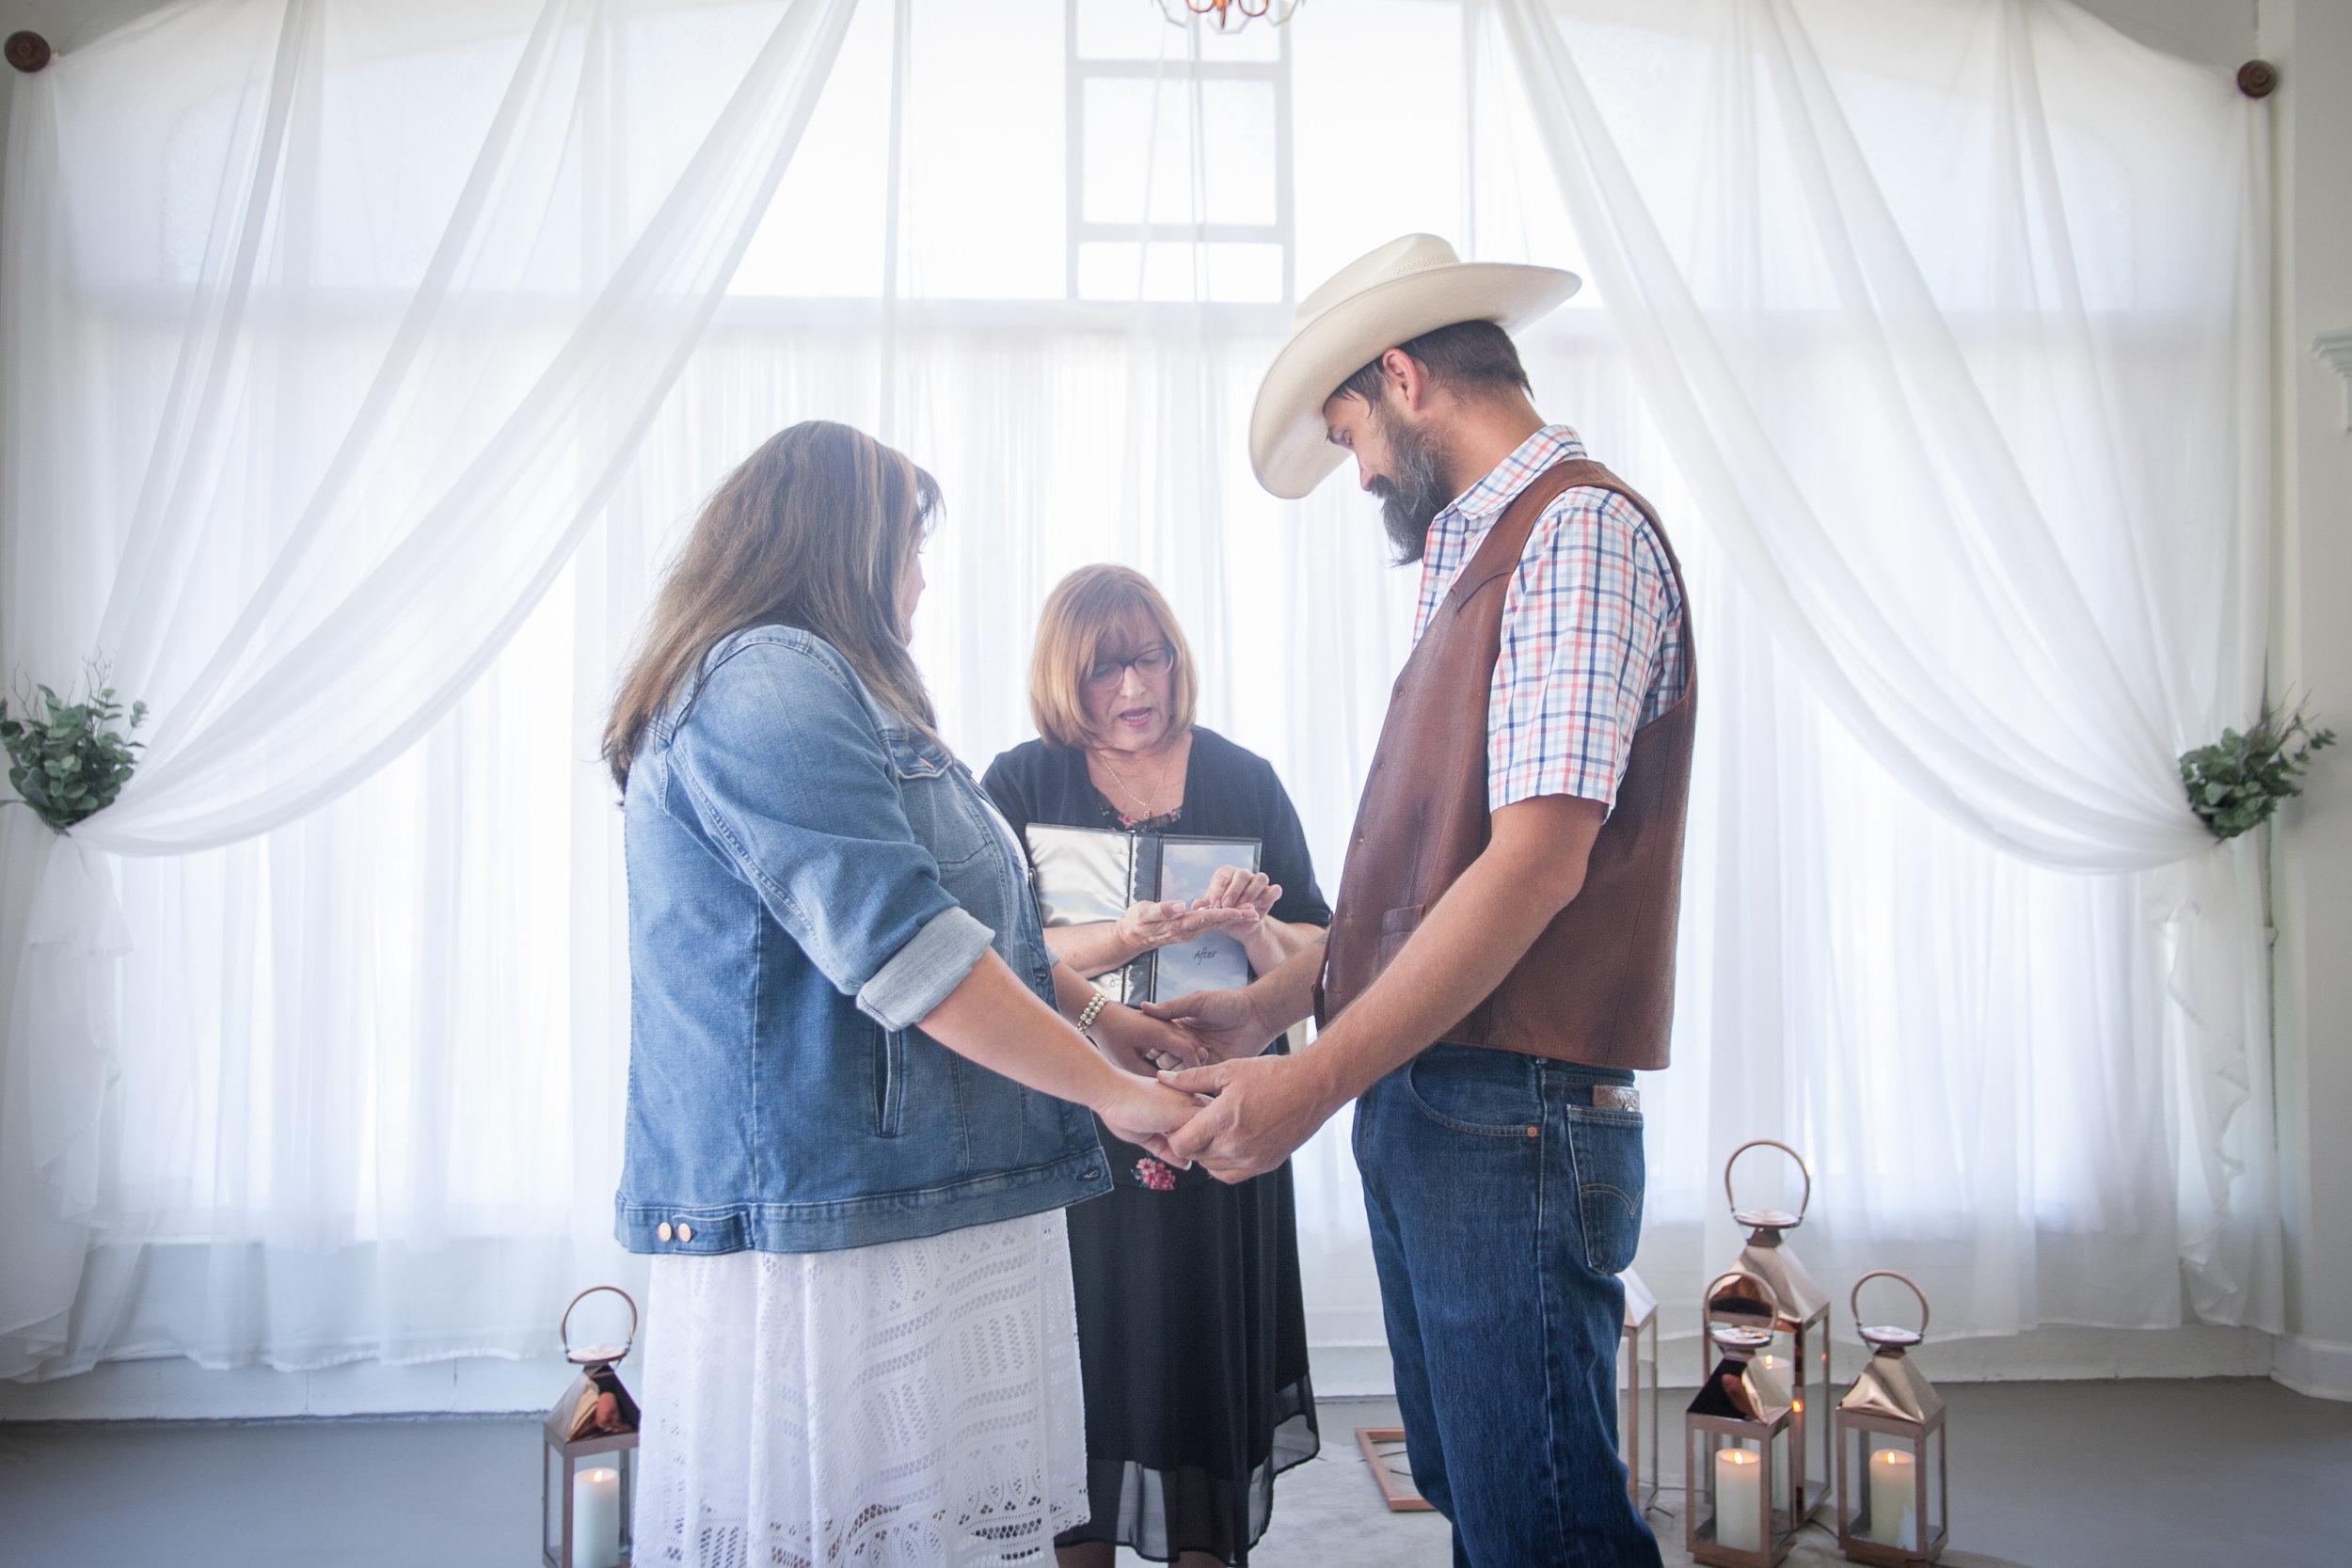 Kansas_City_Small_Wedding_Venue_Elope_Intimate_Ceremony_Budget_Affordable_Wedding Day-30.jpg